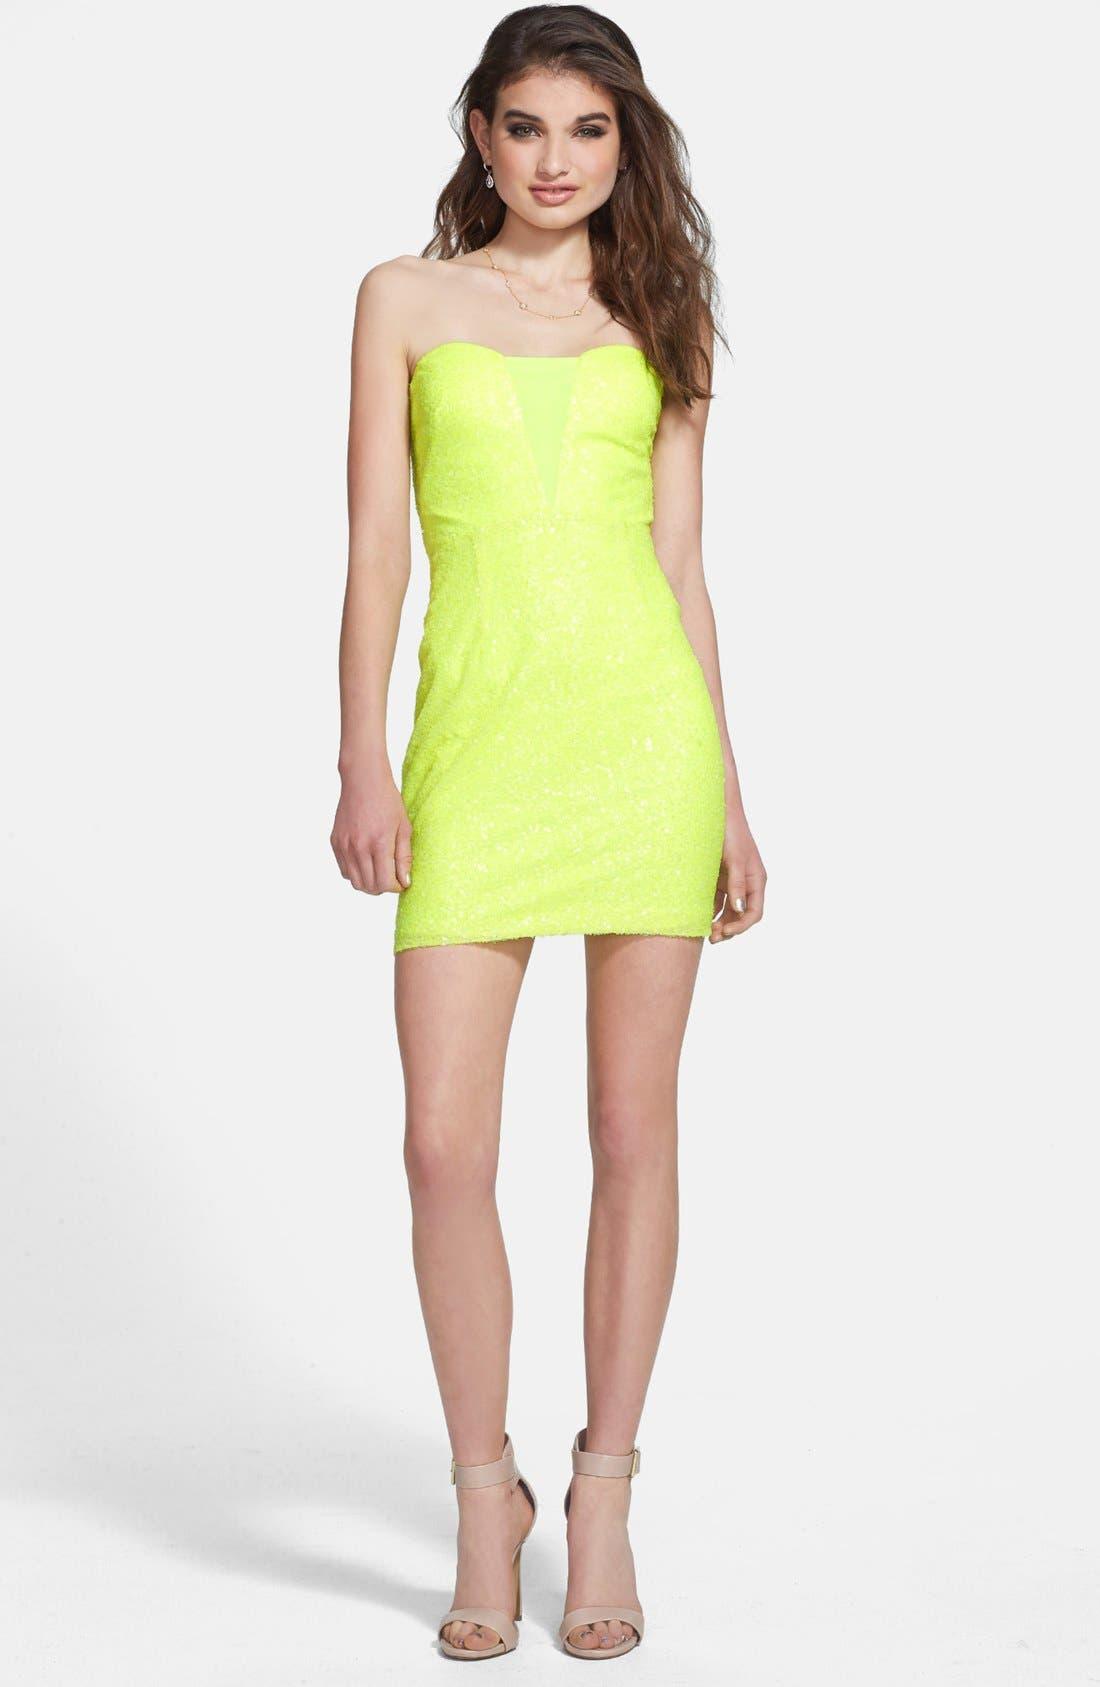 Alternate Image 1 Selected - Hailey Logan Back Cutout Sequin Body-Con Dress (Juniors)